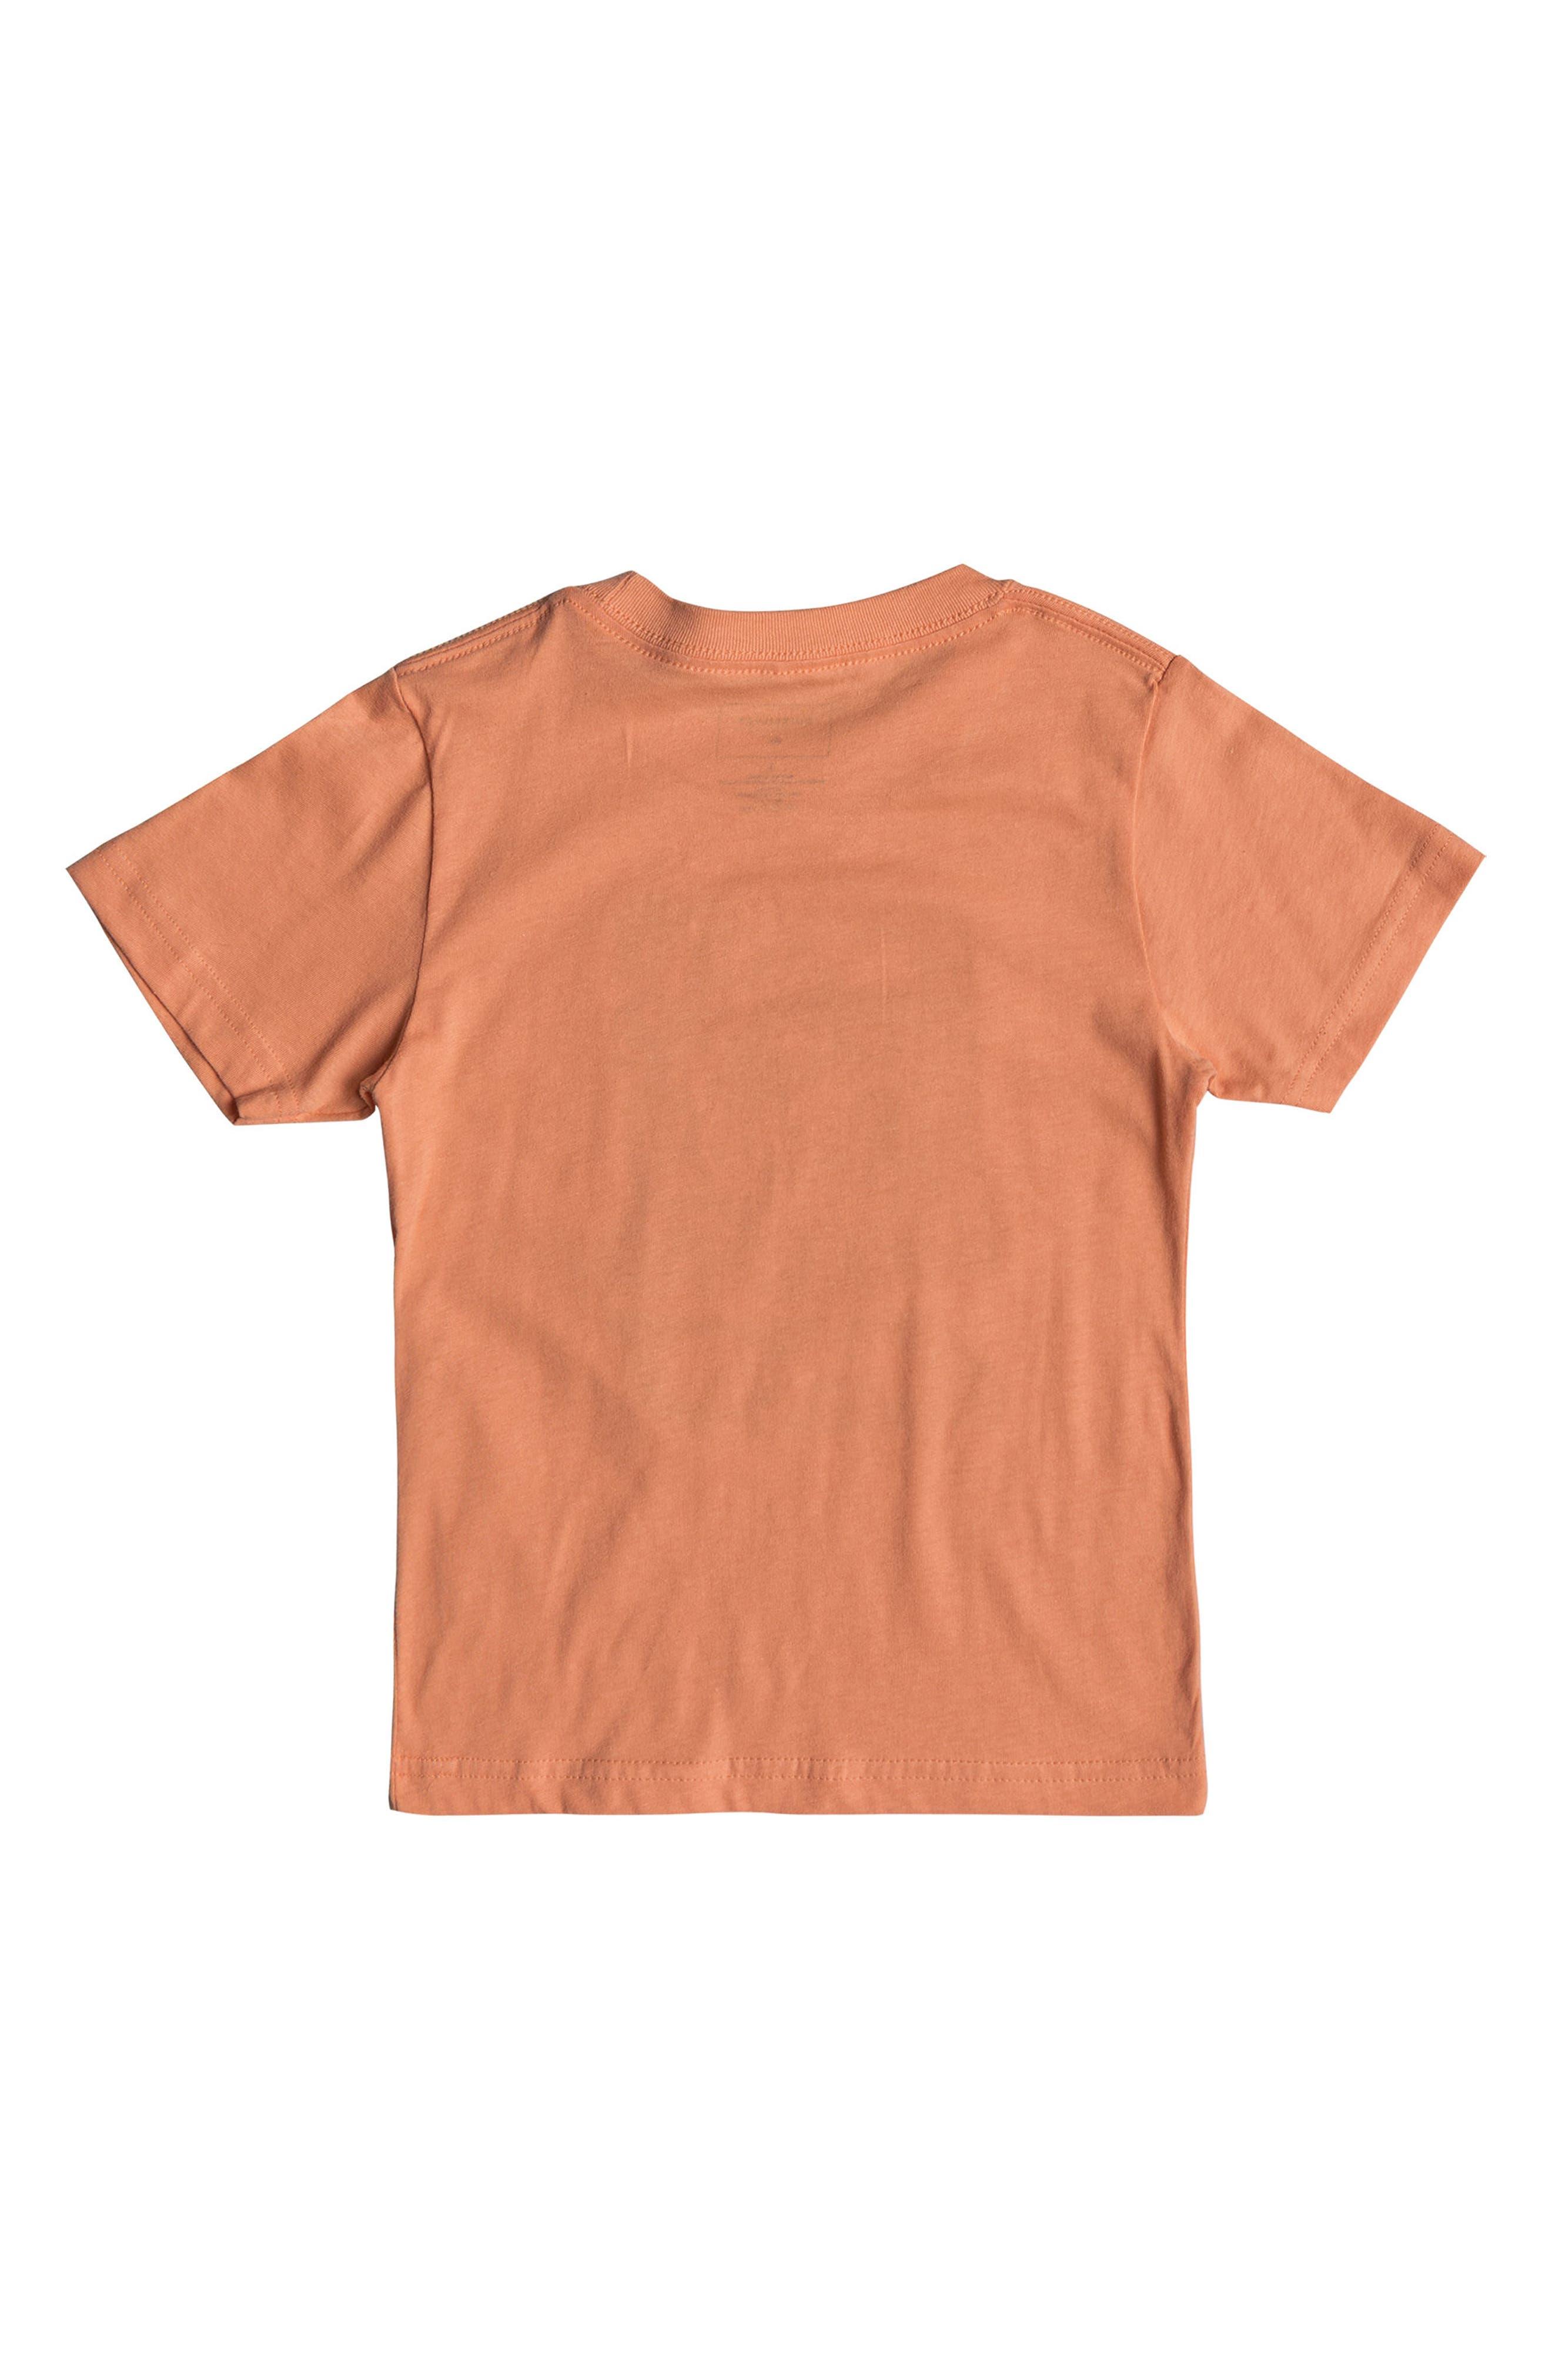 Wauke Graphic T-Shirt,                             Alternate thumbnail 2, color,                             417